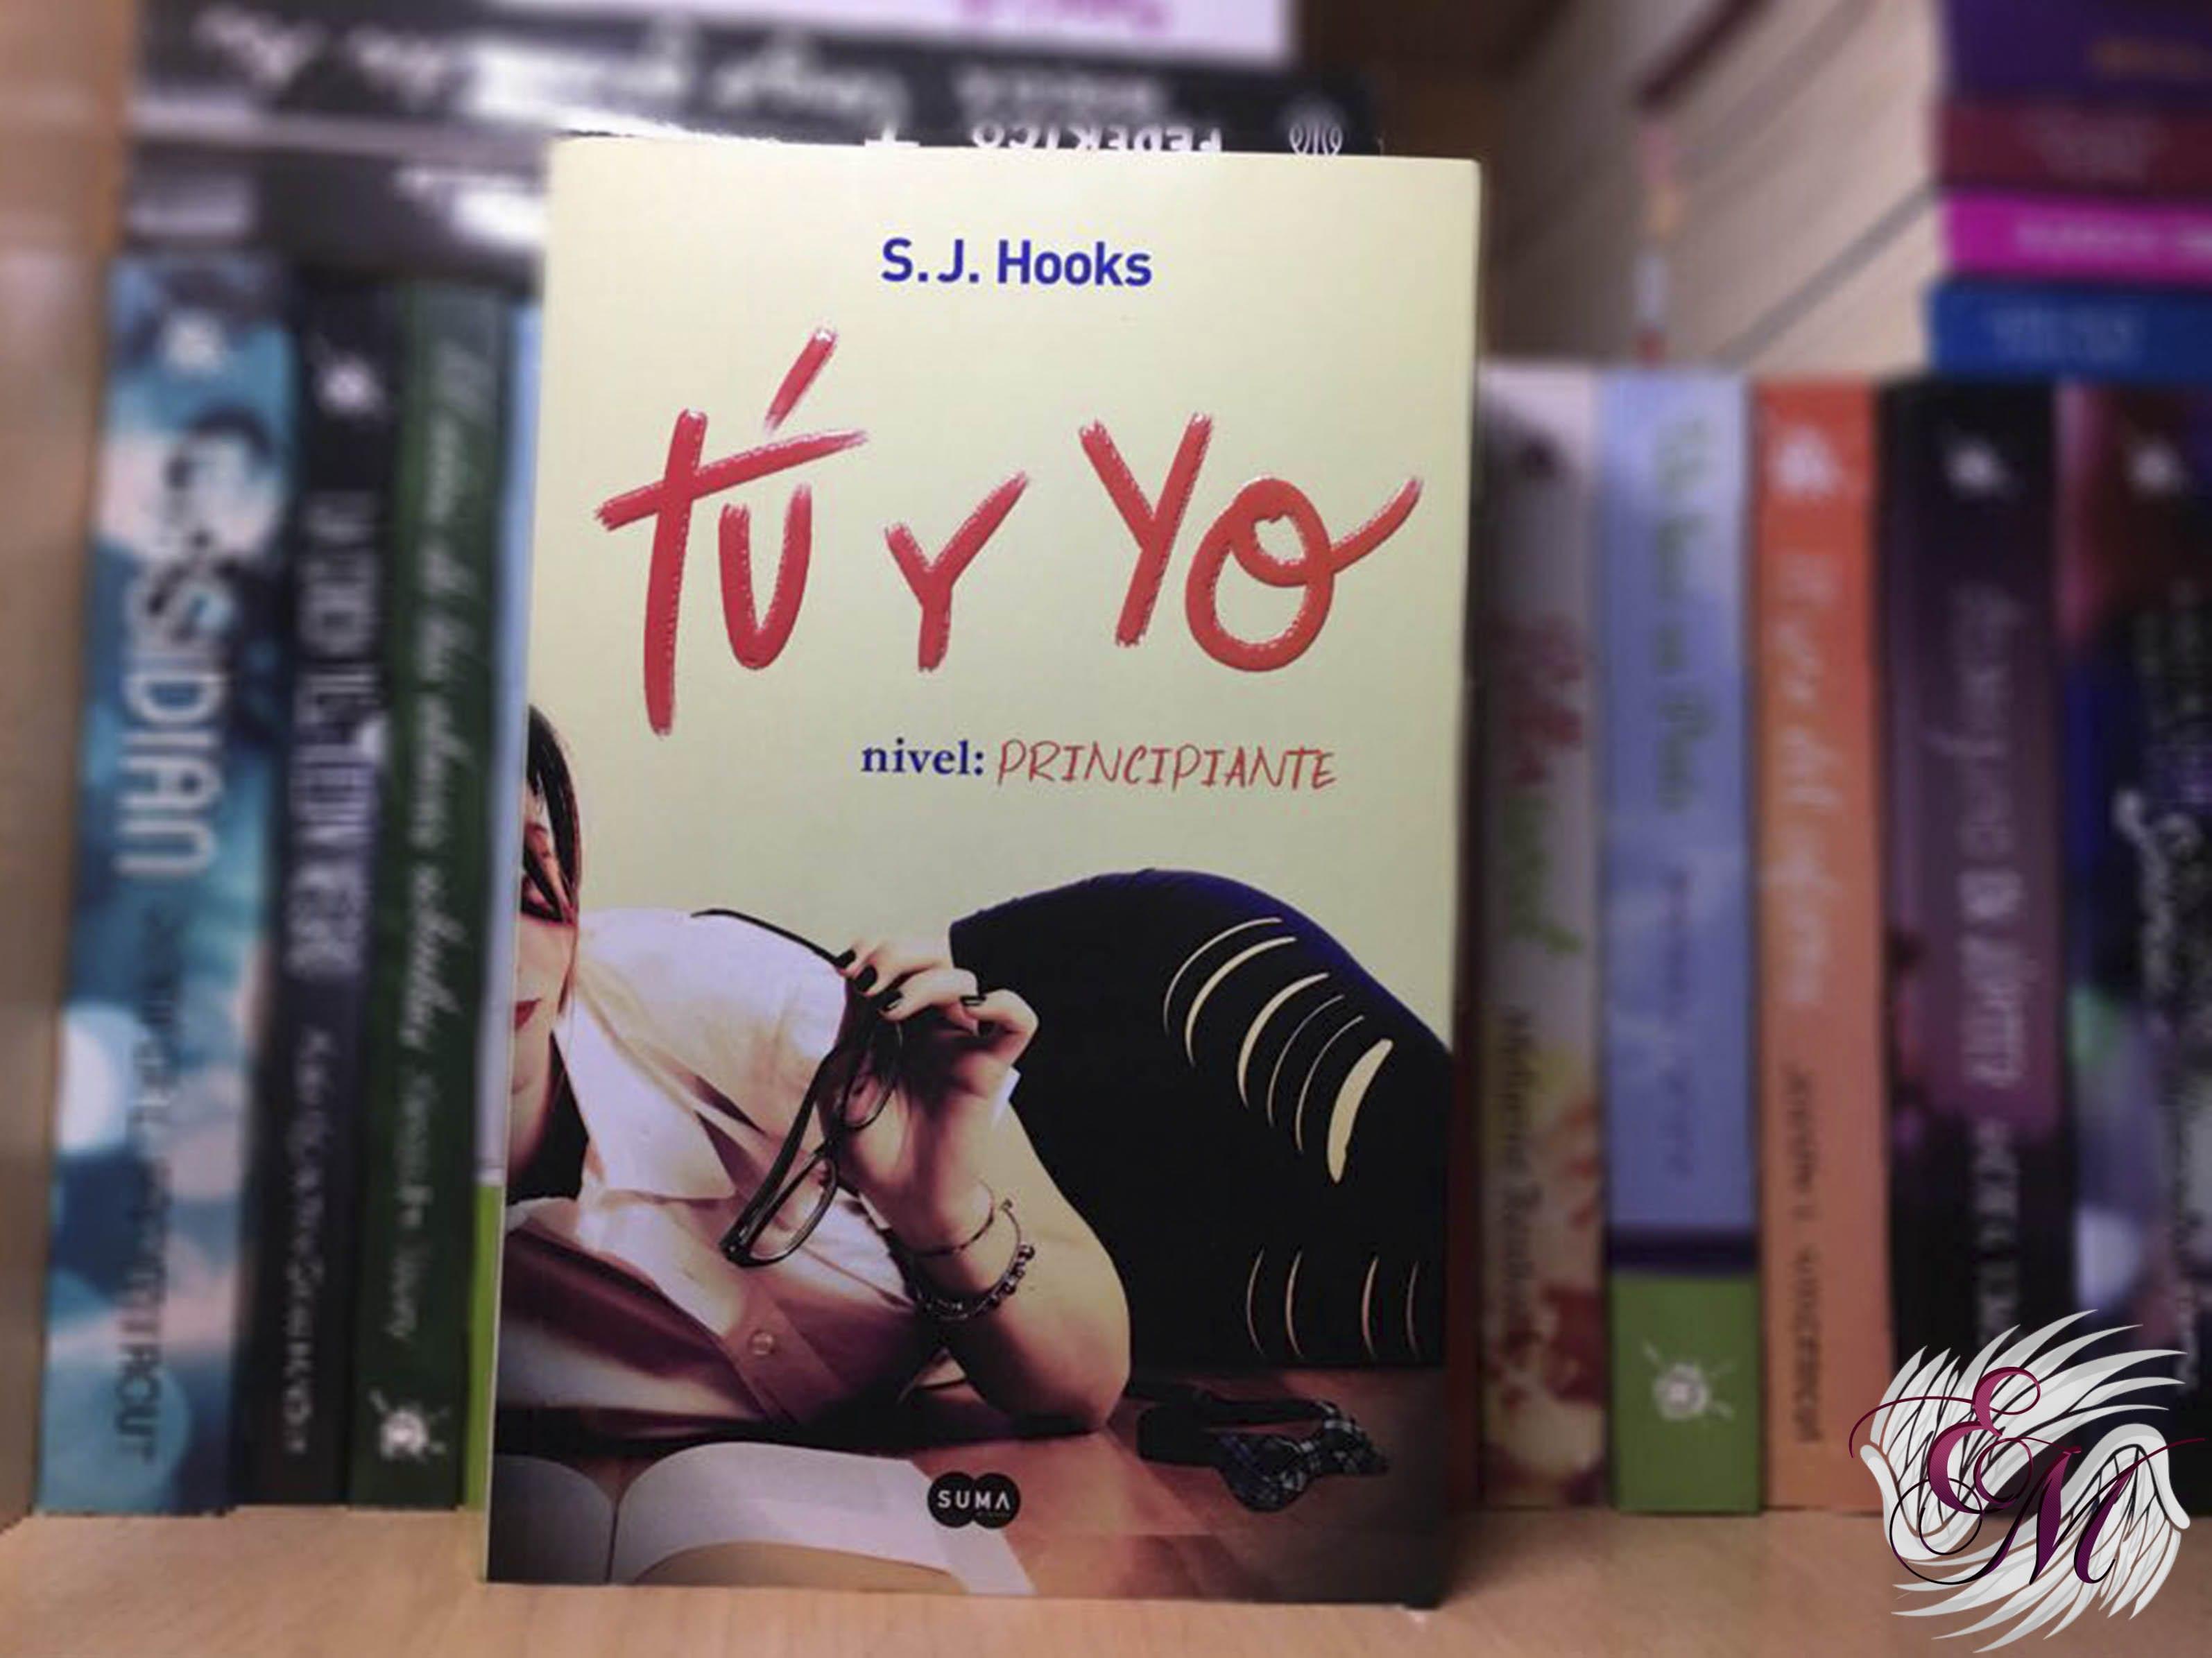 Tú y yo: nivel principiante, de S. J. Hooks - Reseña